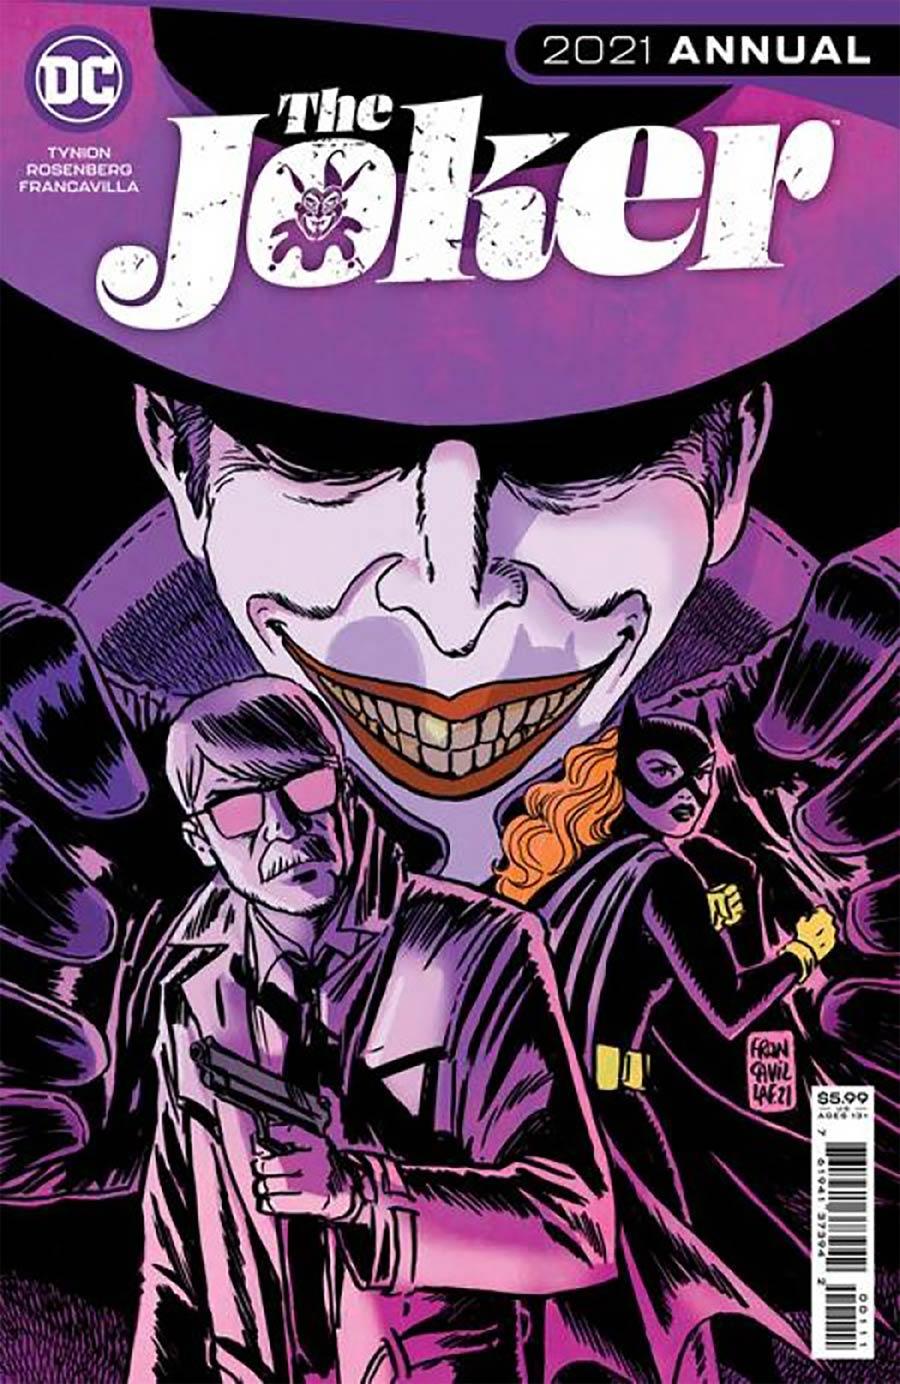 Joker Vol 2 2021 Annual #1 (One Shot) Cover D DF Signed By Matthew Rosenberg